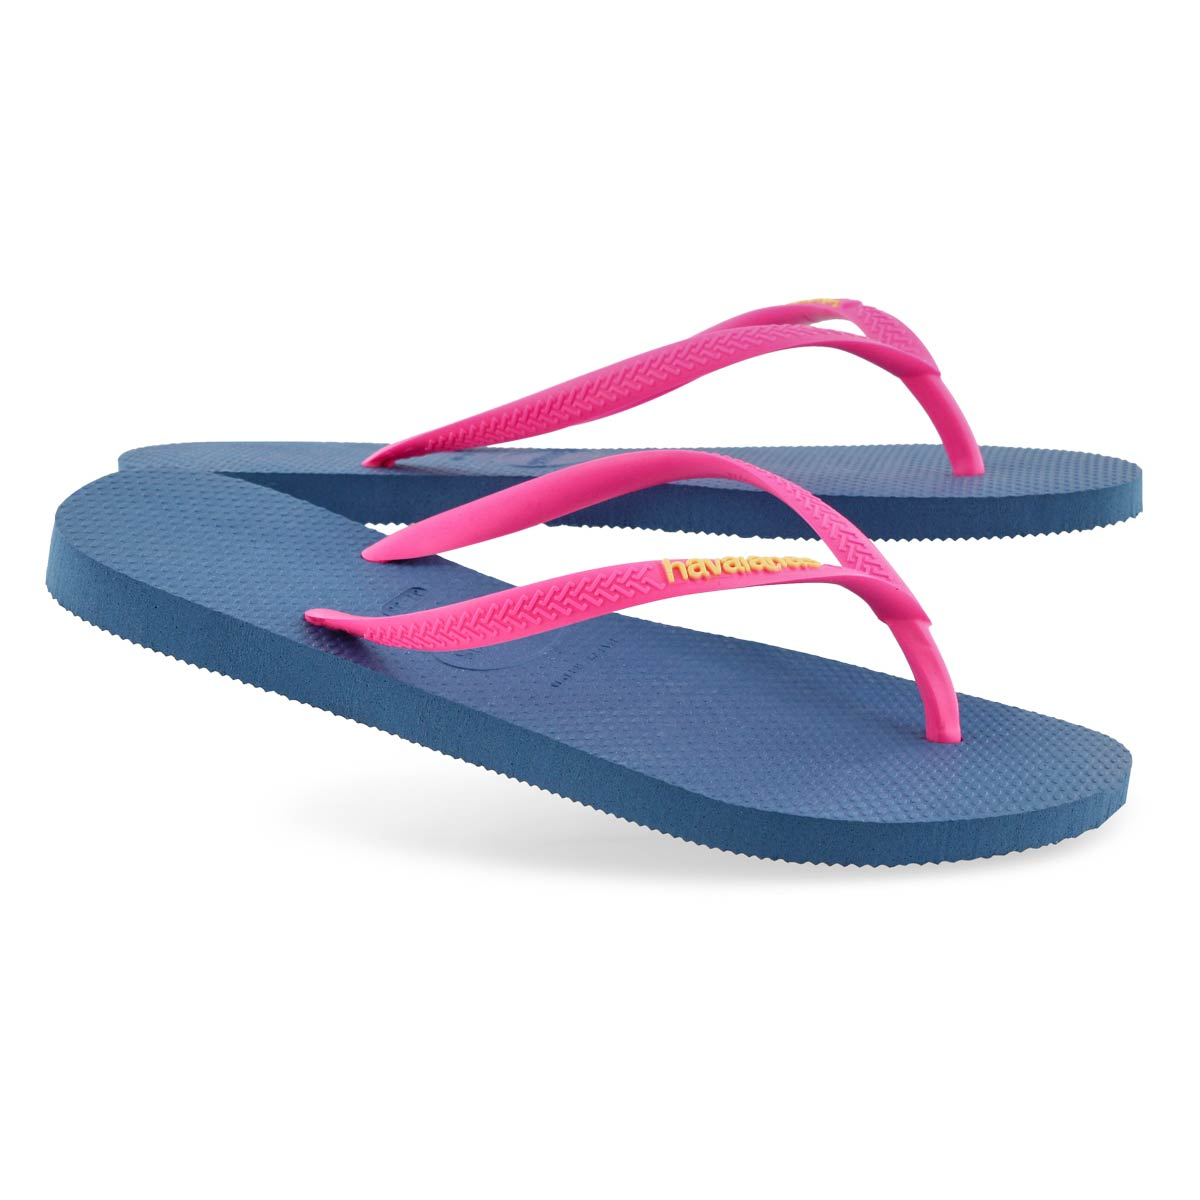 Women's Slim Logo Pop Up Flip Flop - Blue